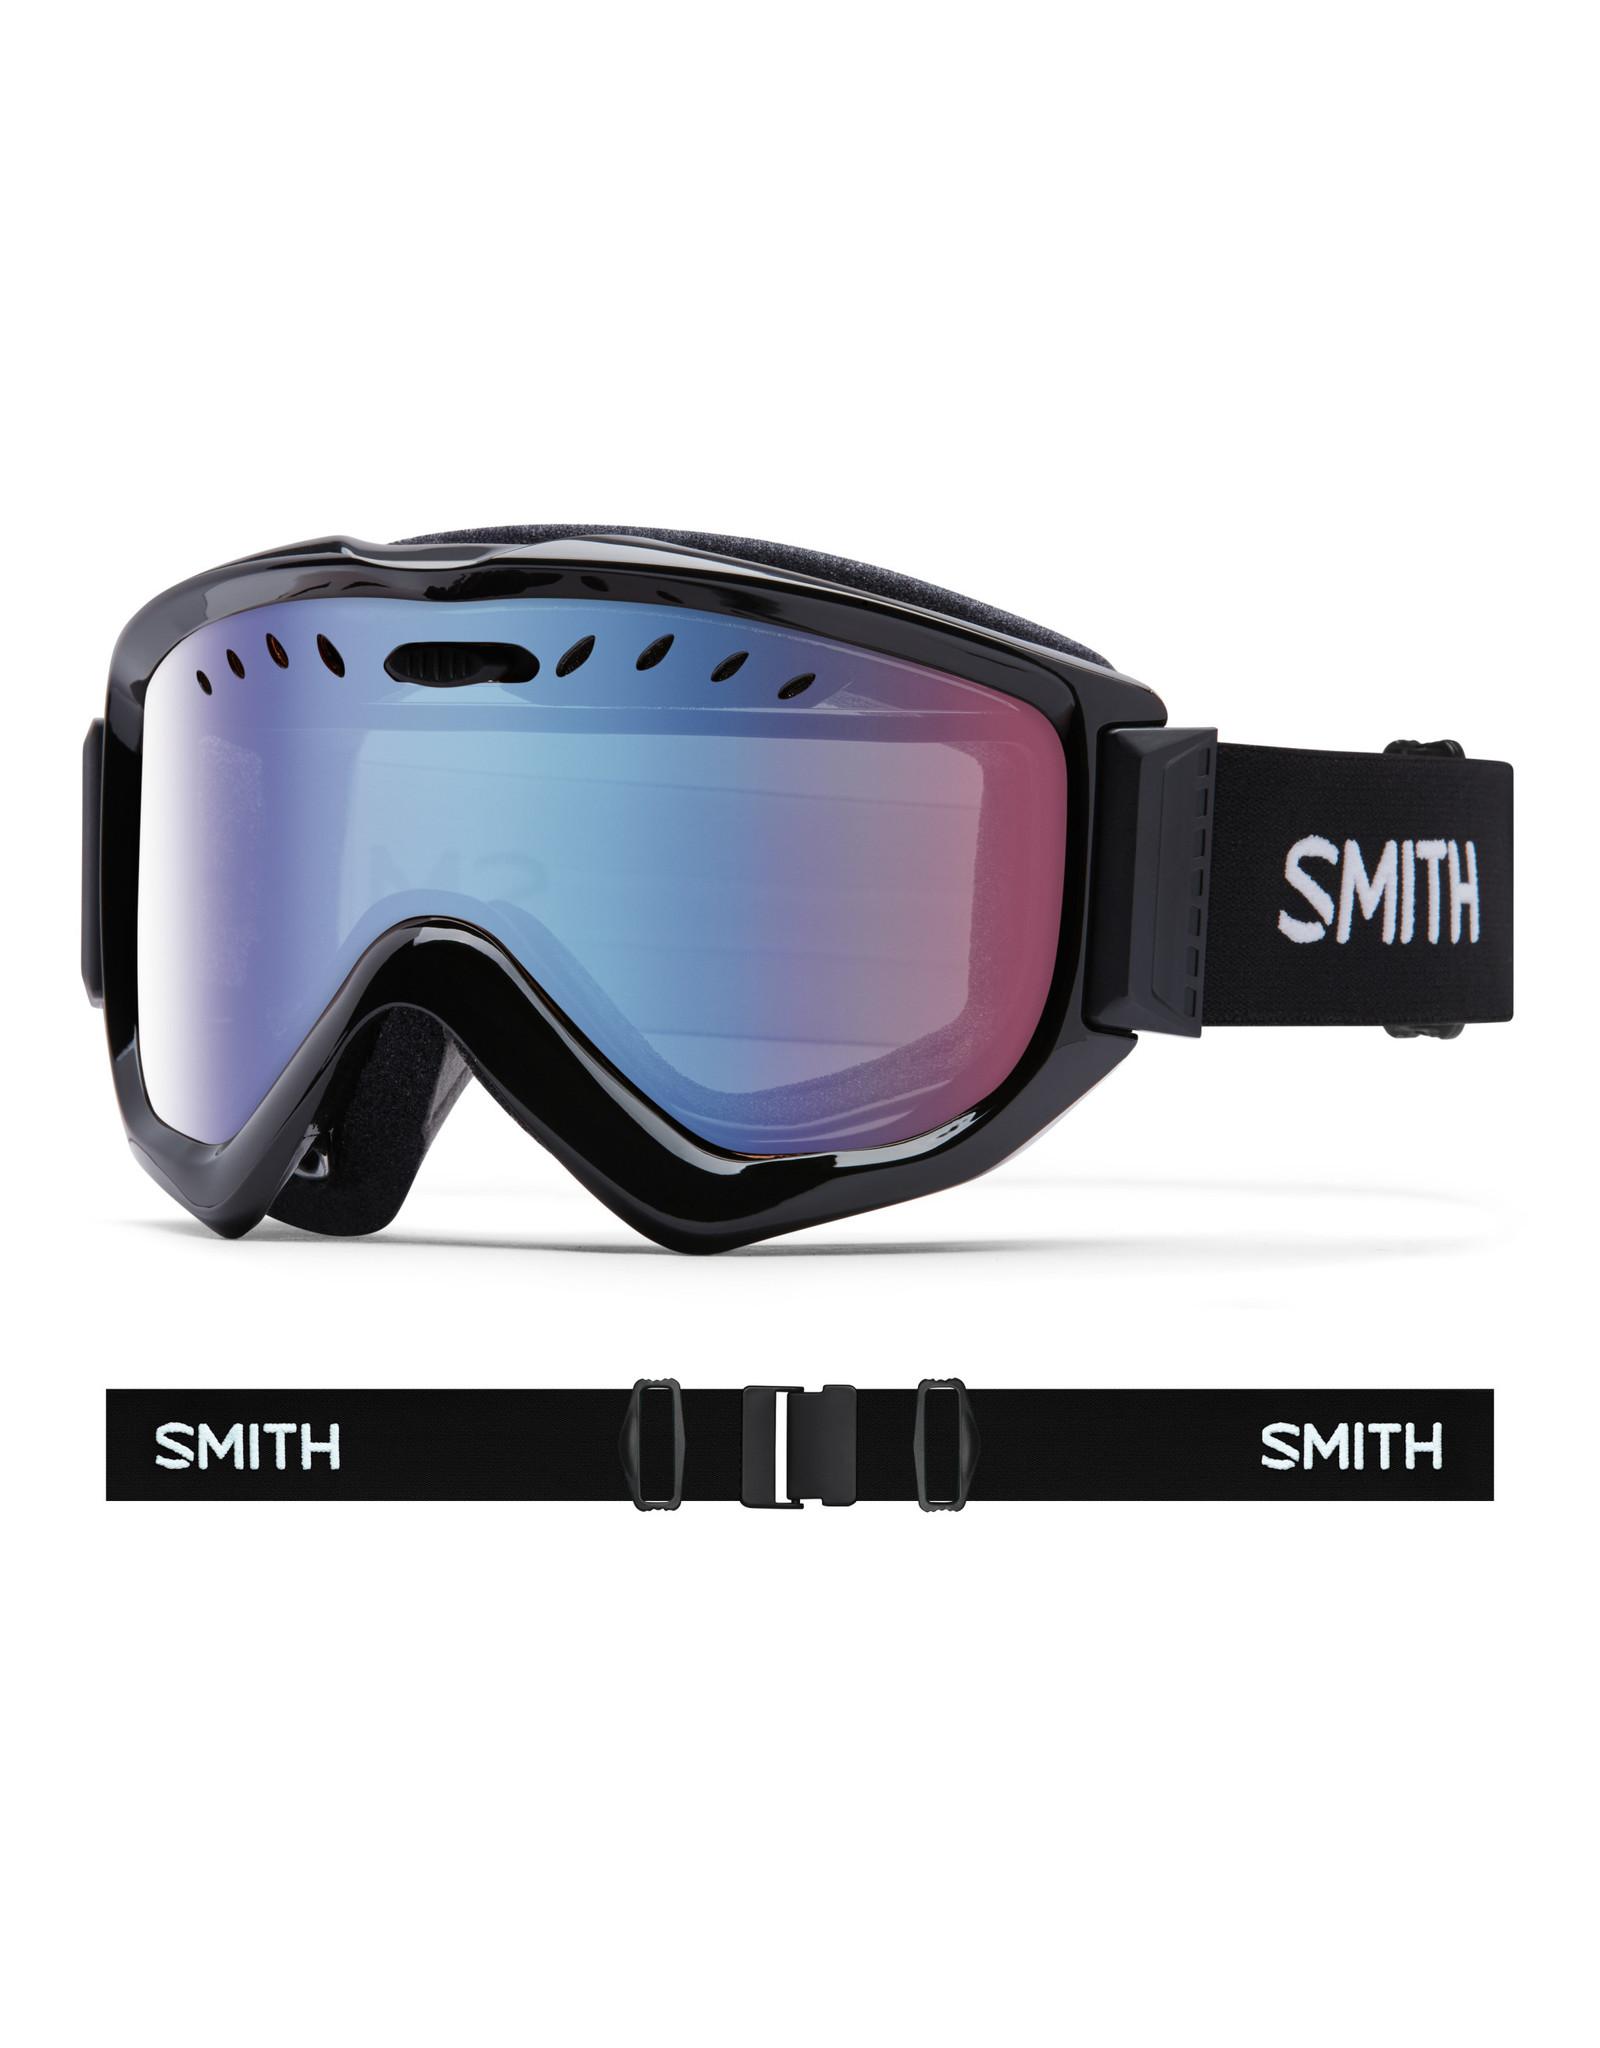 Smith SMITH KNOWLEDGE OTG BLACK 20 LUNETTES DE SKI